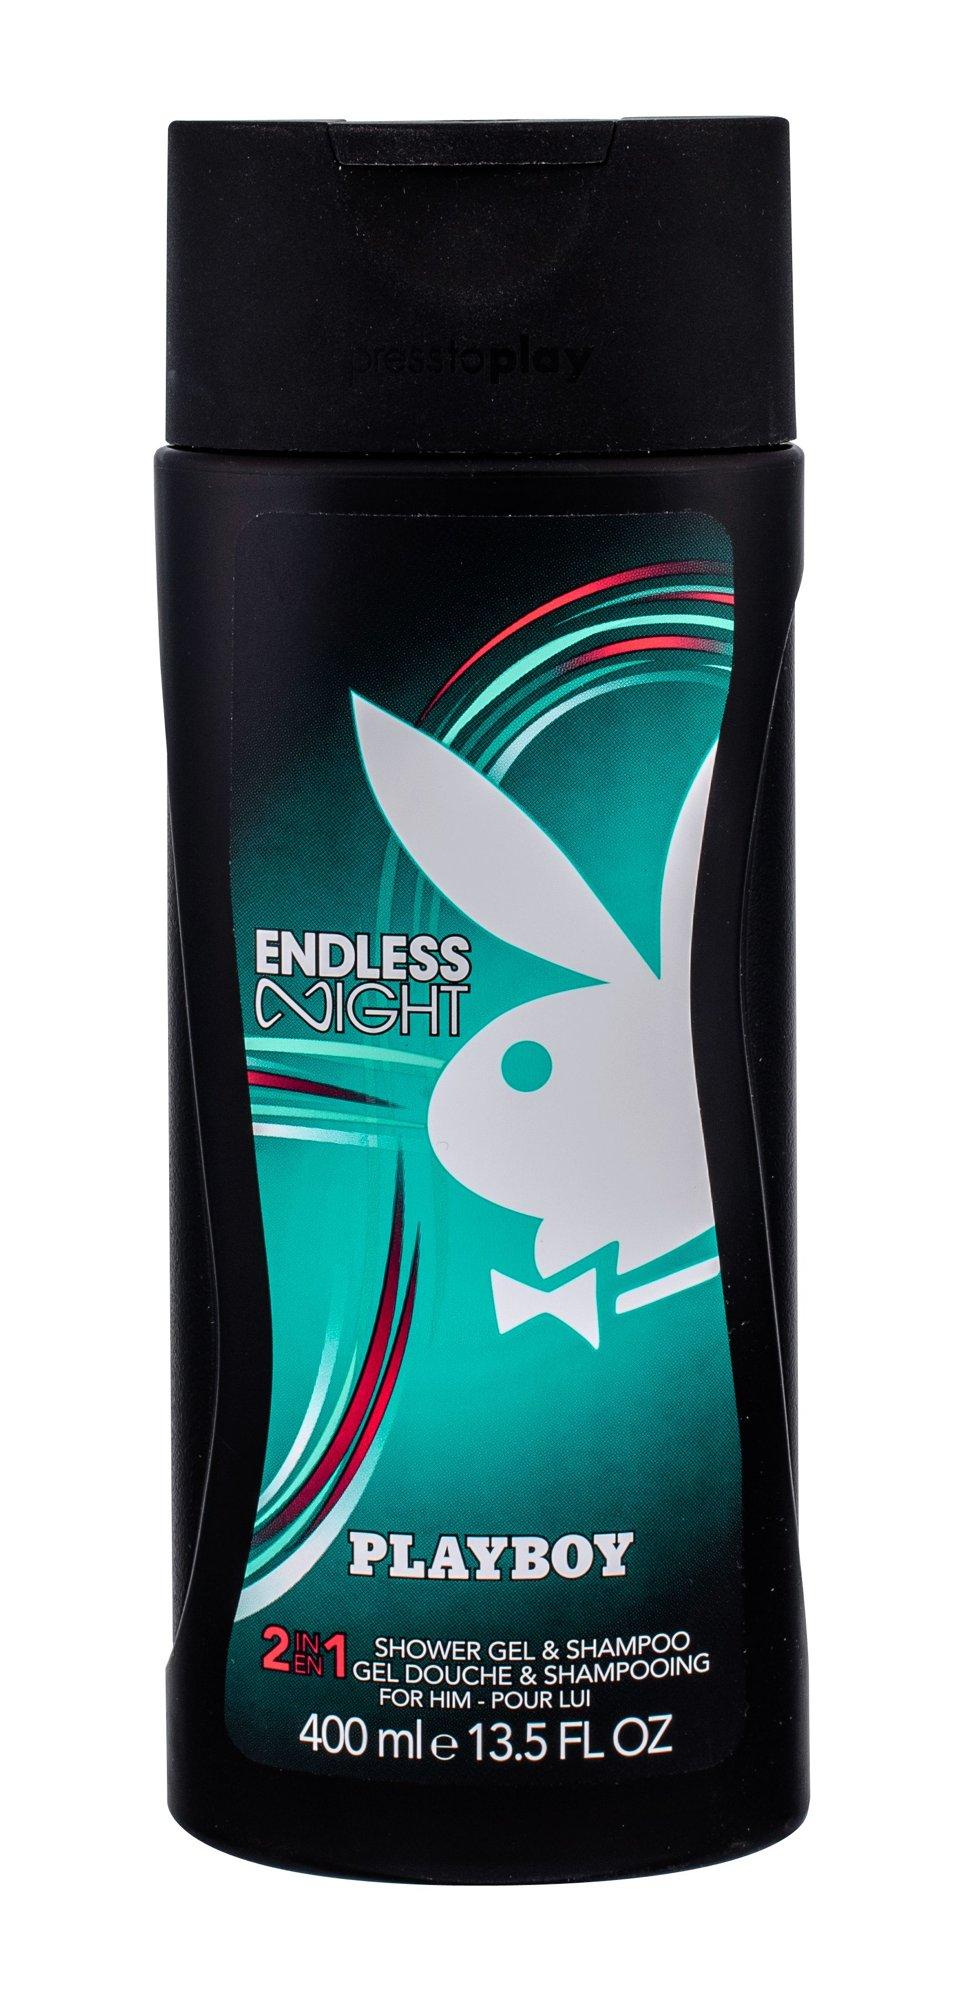 Playboy Endless Night Shower gel 400ml